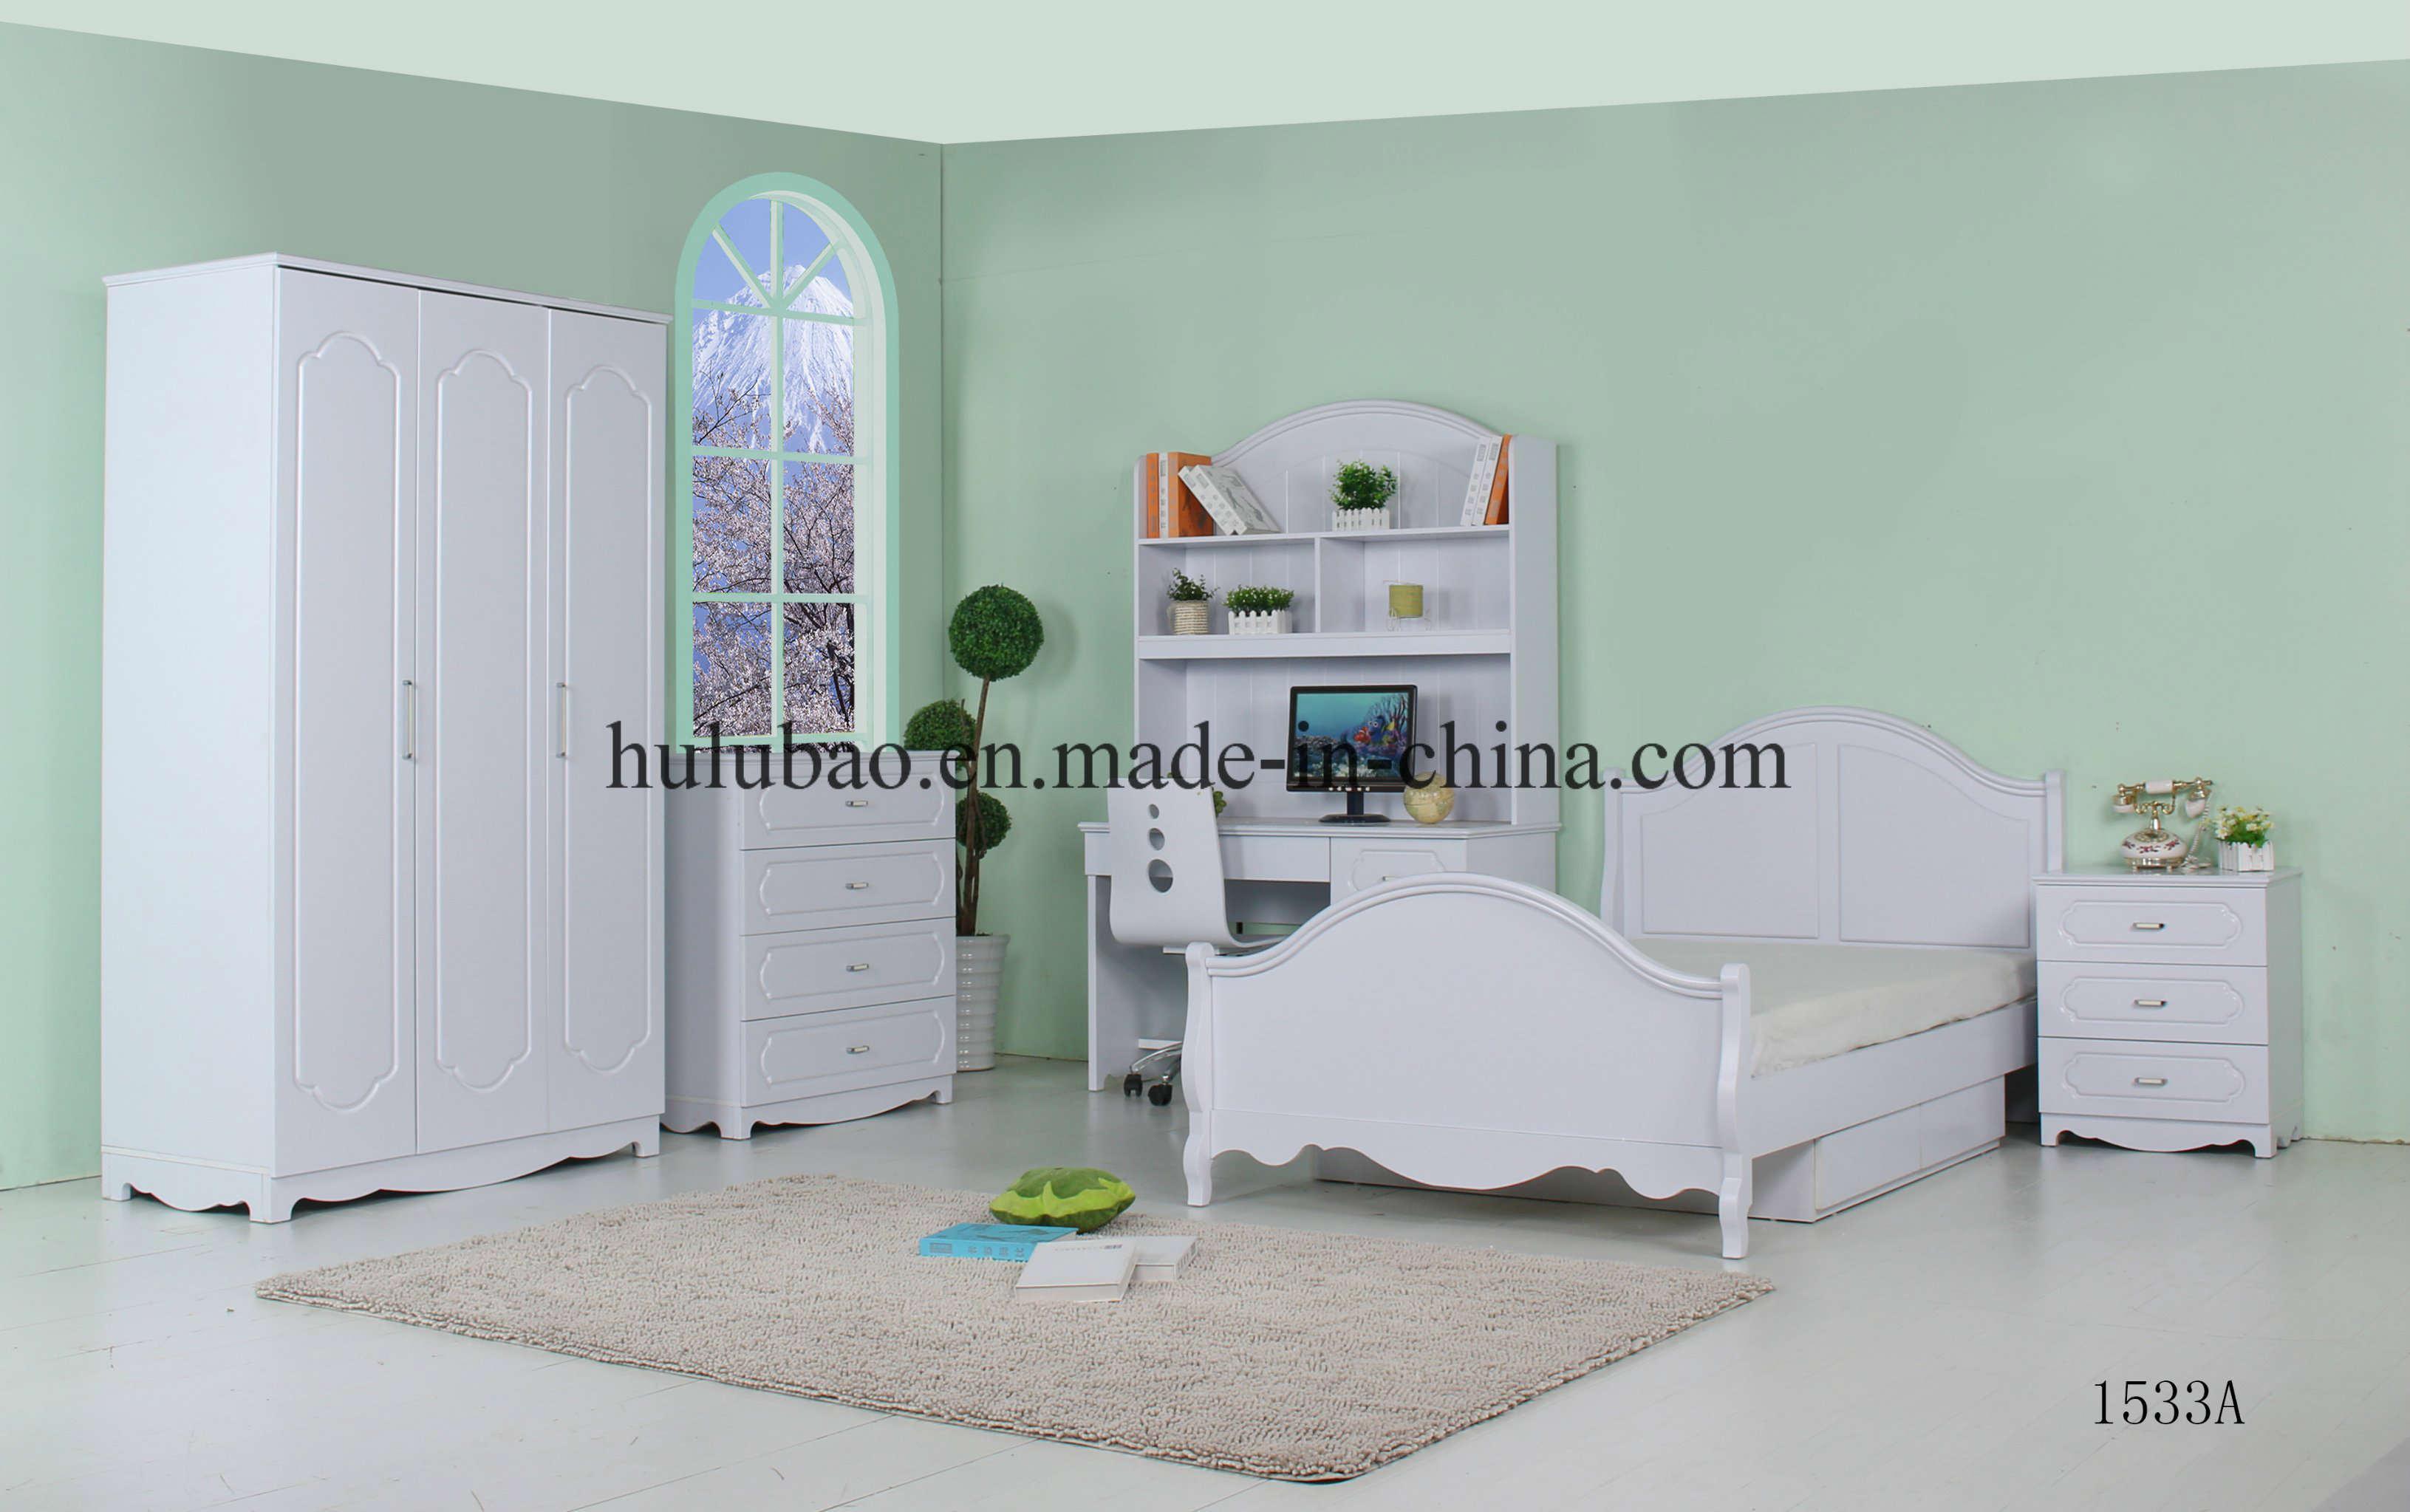 china children bedroom furniture. China Children Furniture Set Baby Furntiure Kids Bedroom 2017 New - Furniture, Sets